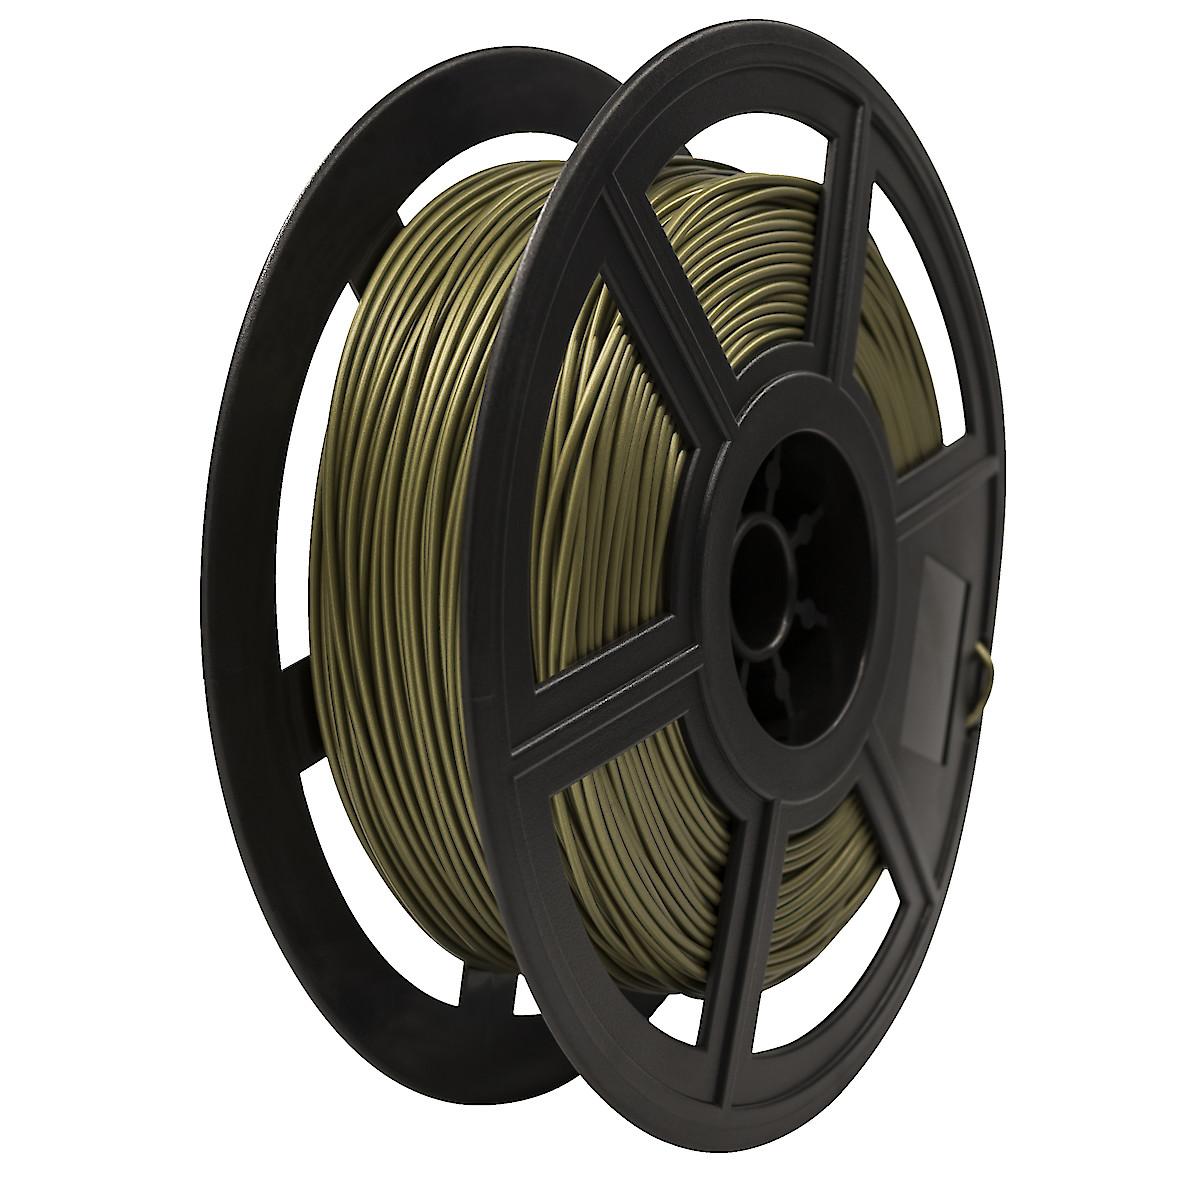 Clas Ohlson PLA Metal Filament for 3D Printer